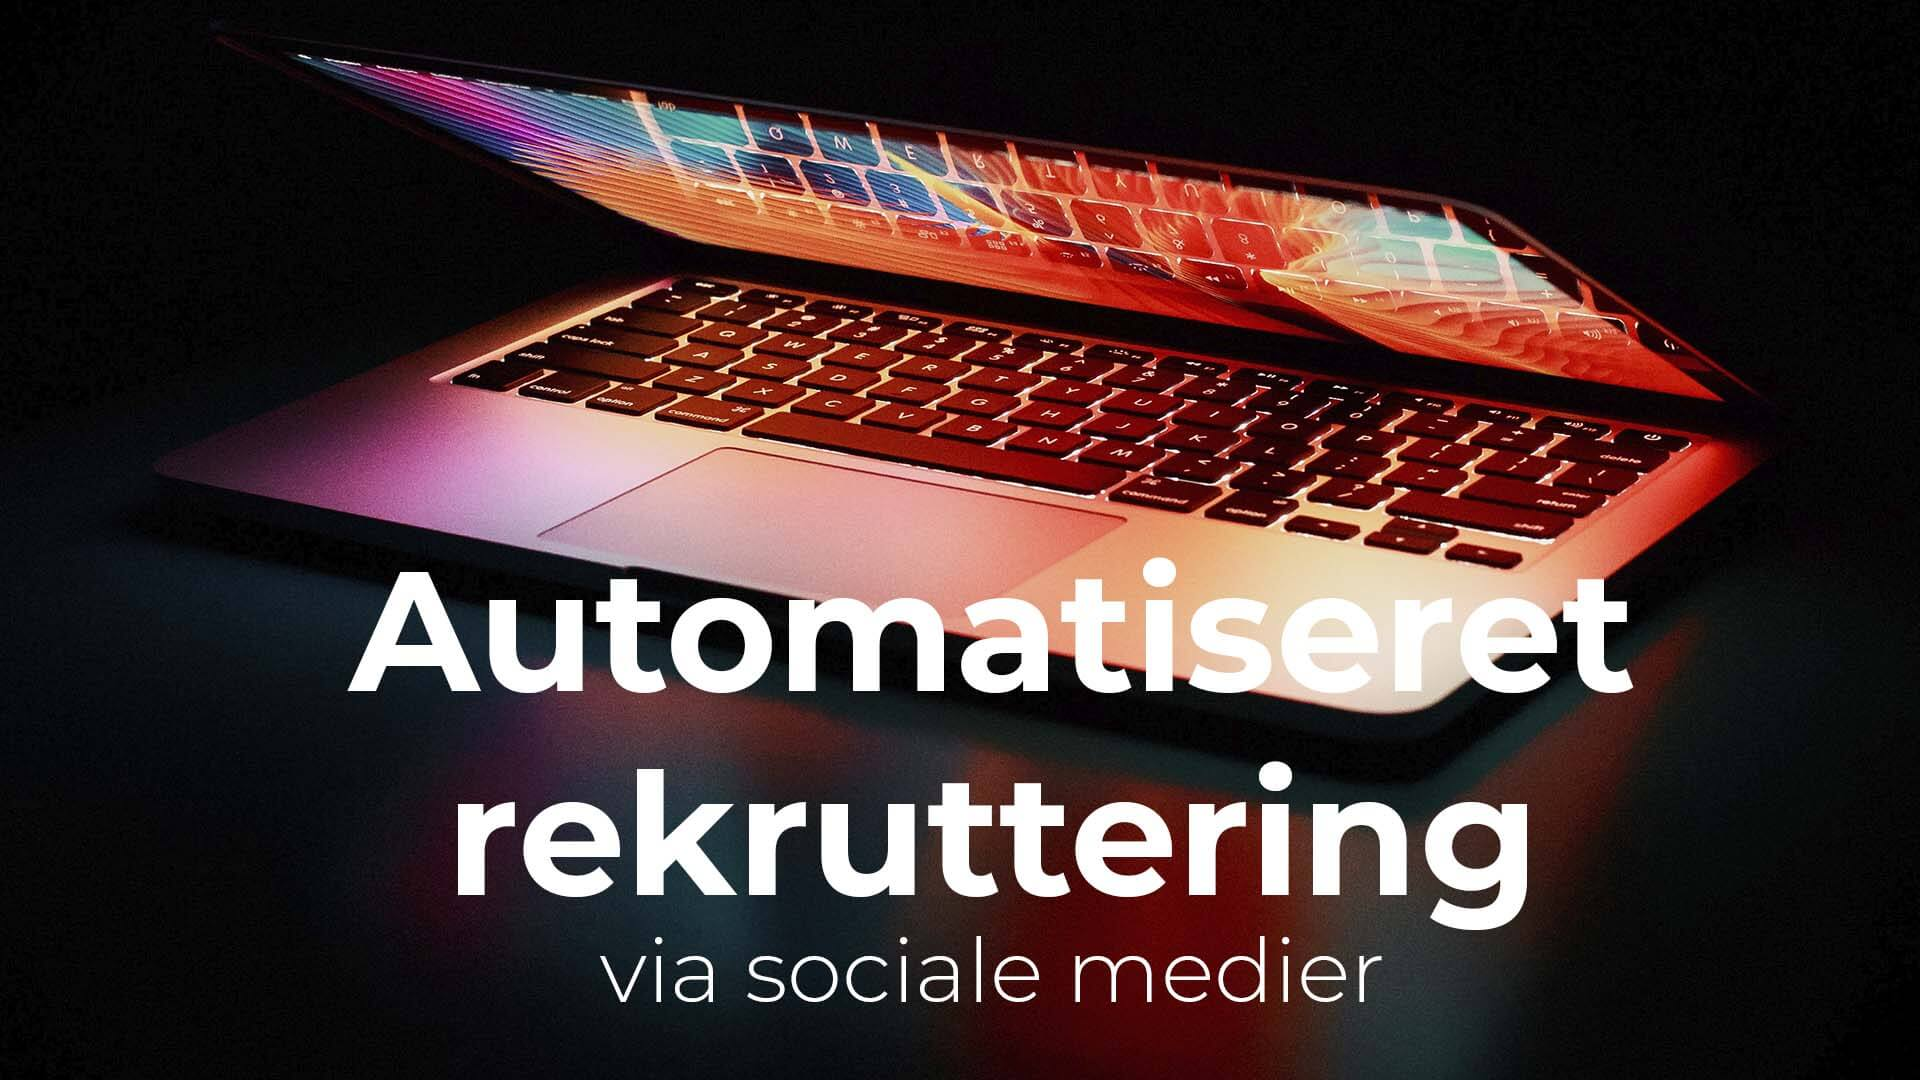 Automatiseret rekruttering via sociale medier